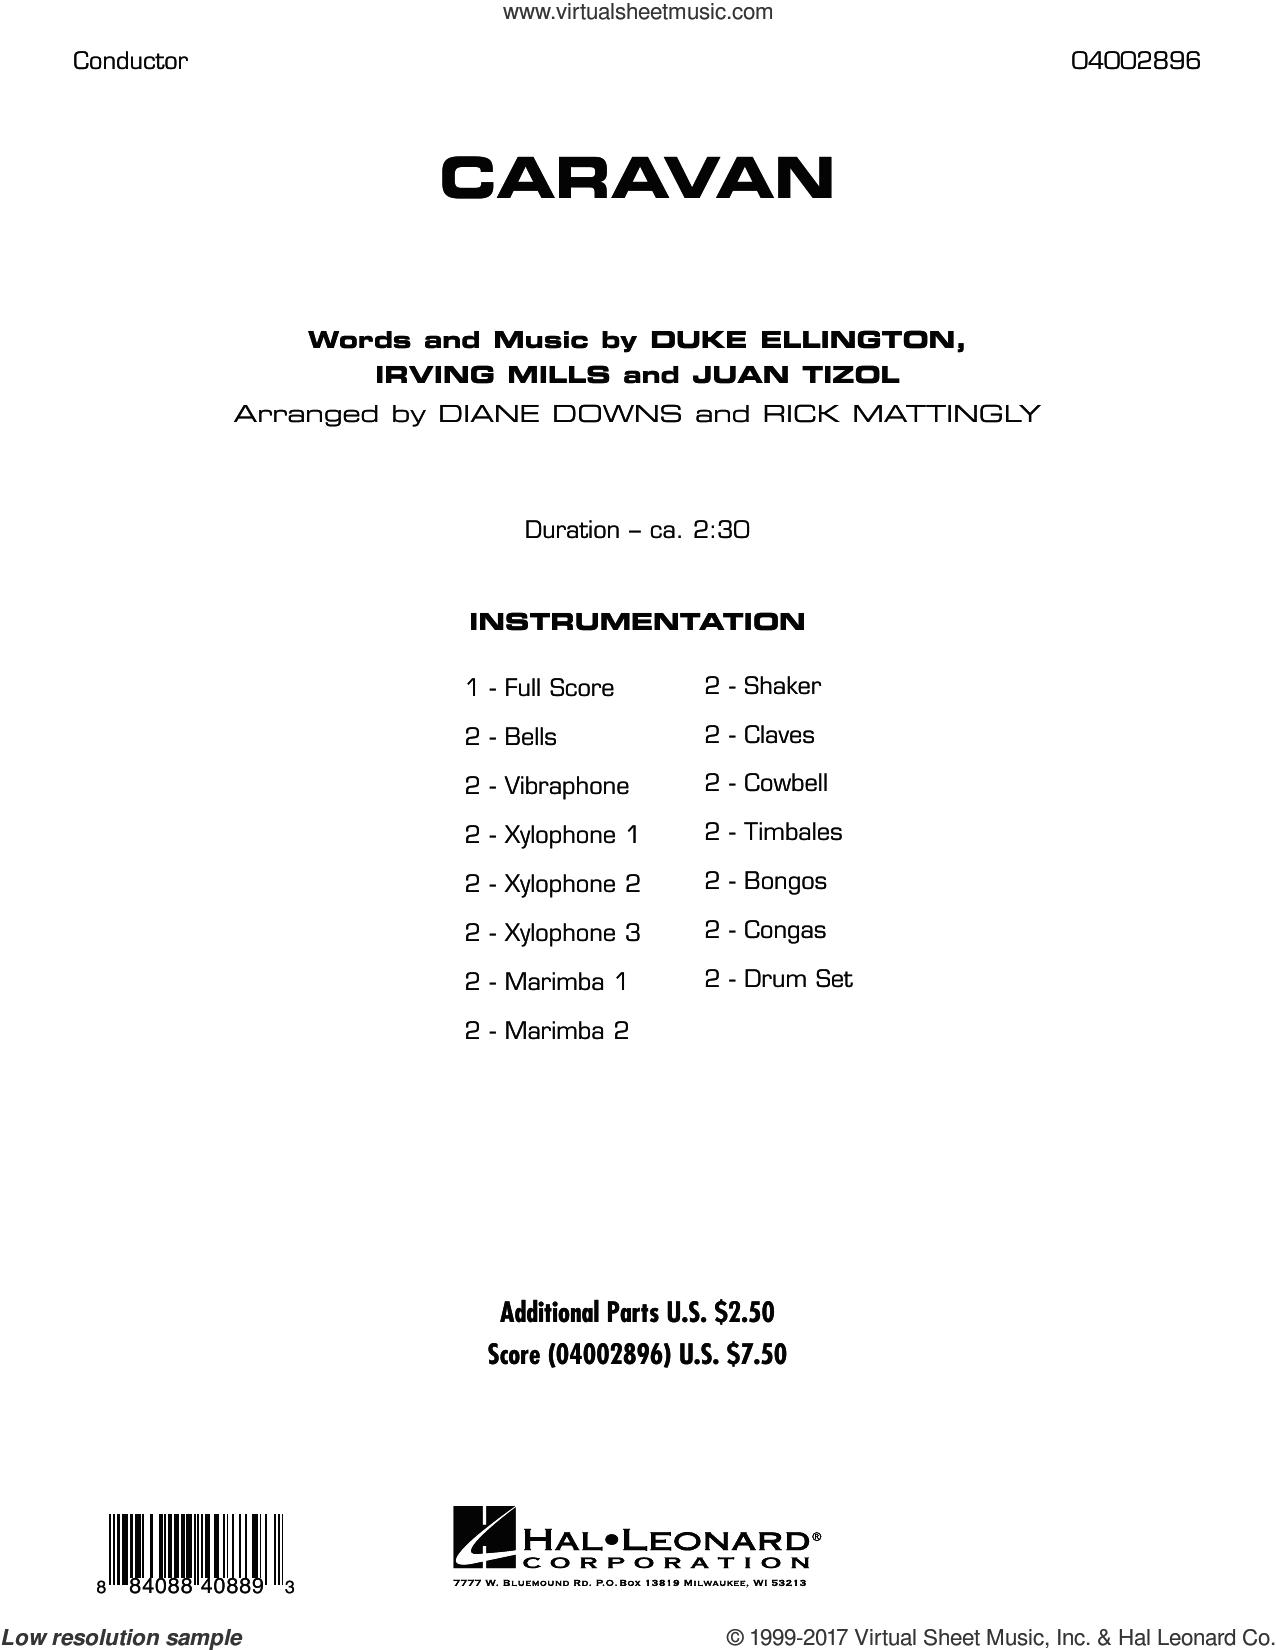 Caravan (COMPLETE) sheet music for concert band by Duke Ellington, Diane Downs, Irving Mills, Juan Tizol and Rick Mattingly, intermediate skill level